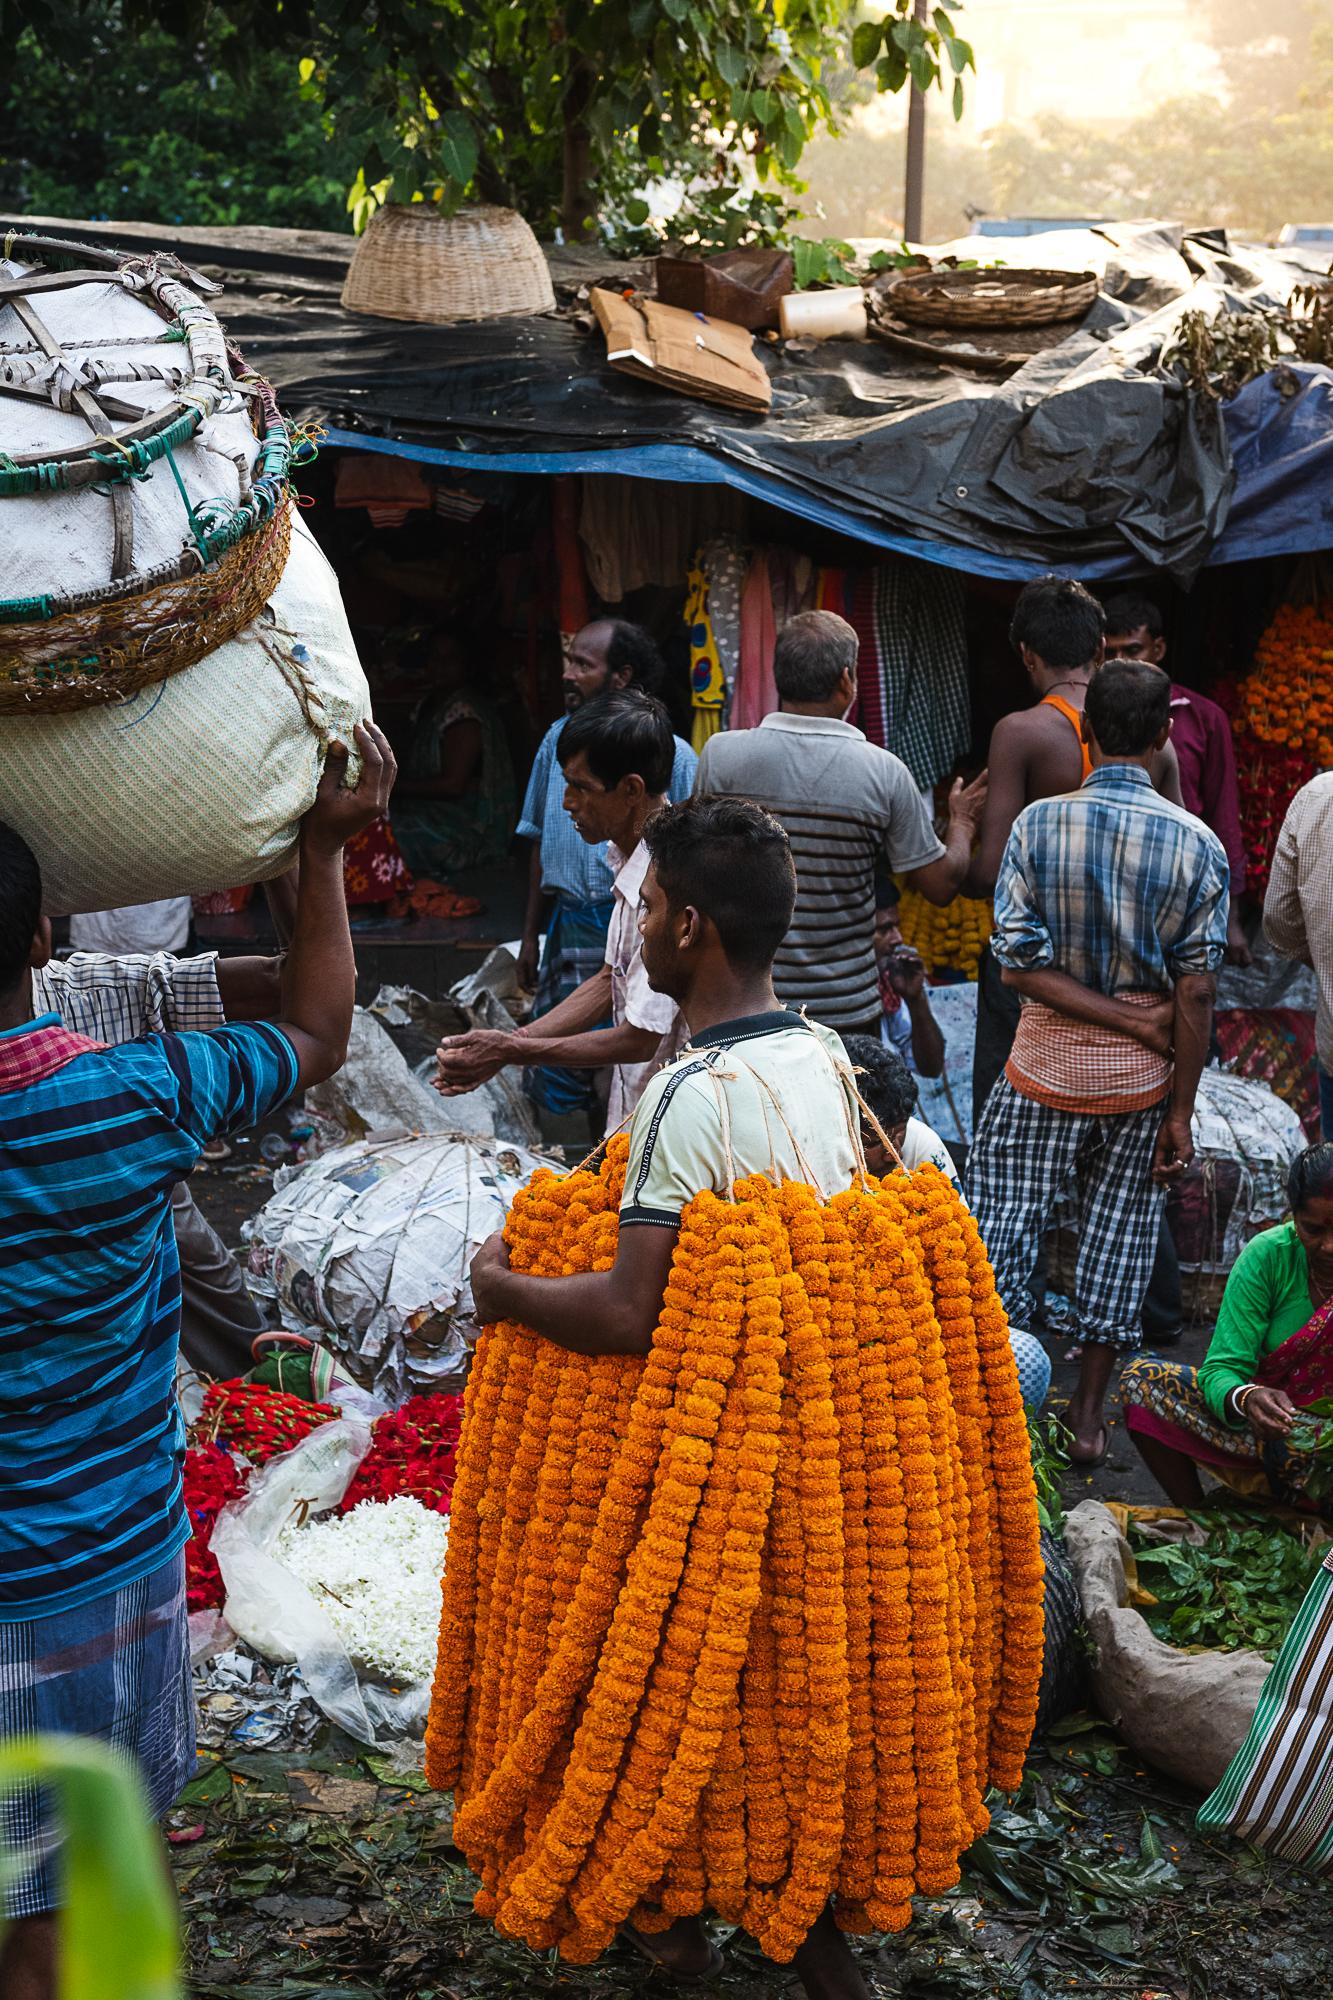 Mallik Ghat Flower Market - vendor carrying marigold chains